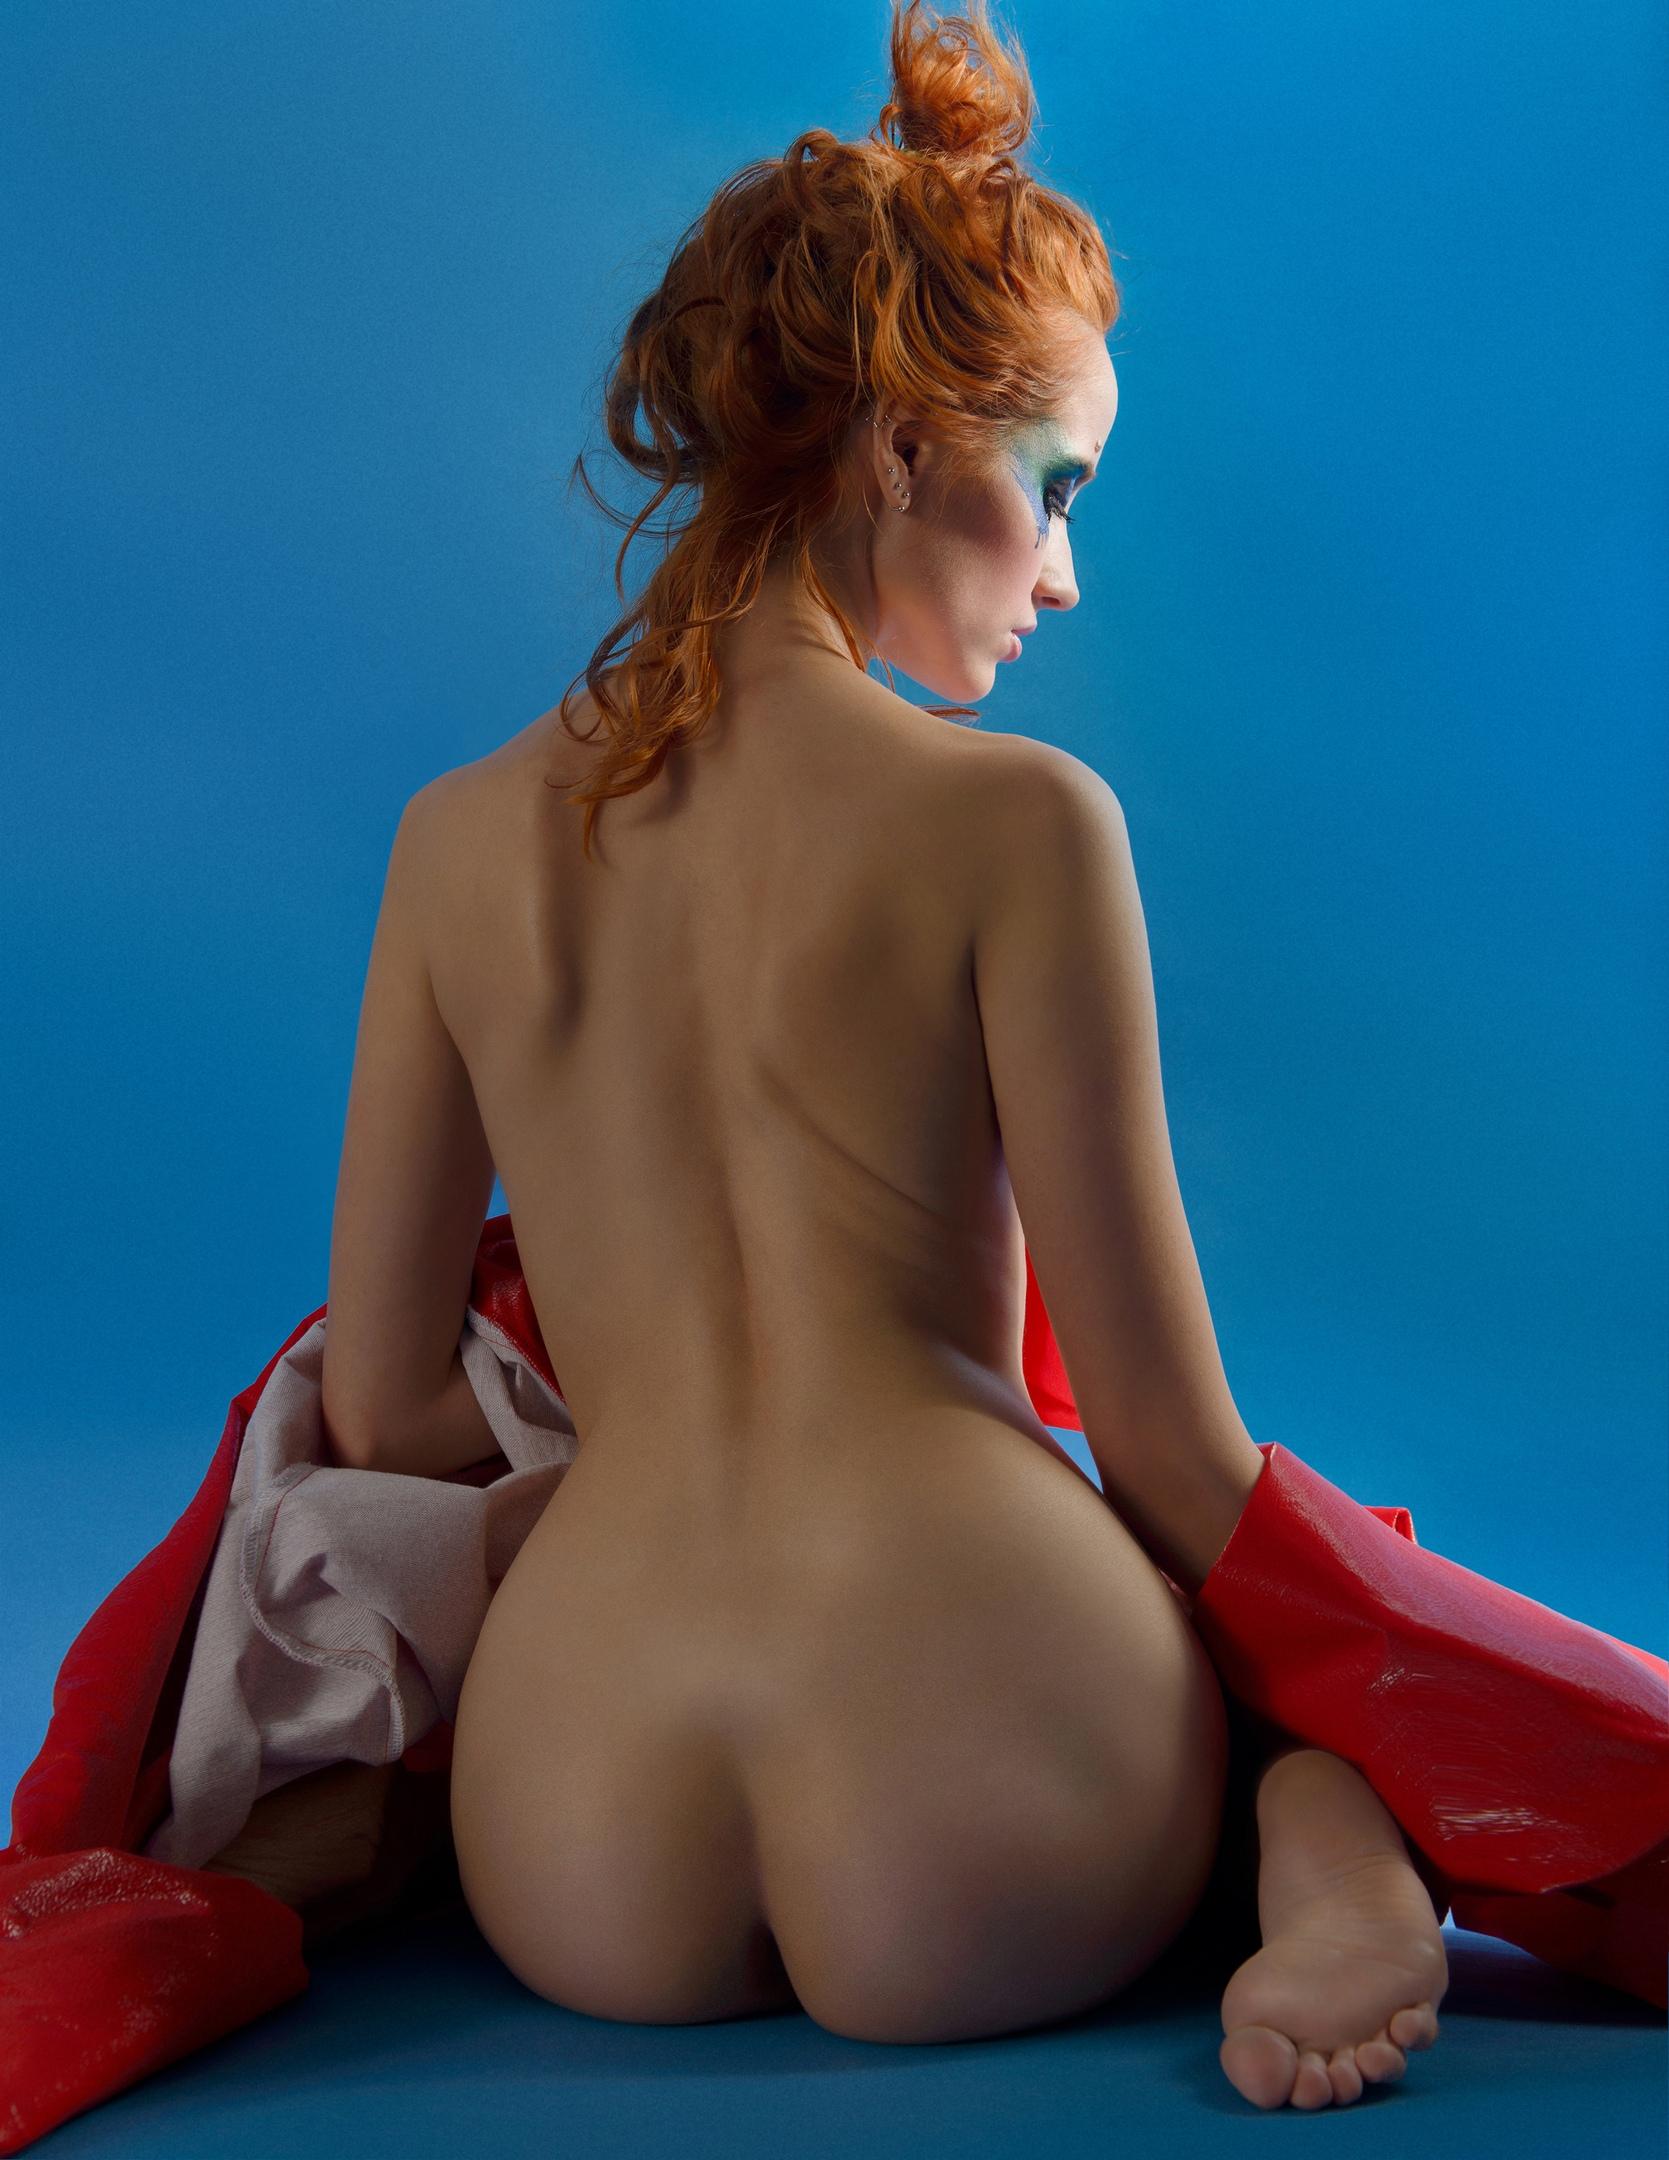 Mua : [id72925479|Марина Дарда] Dress: [id154312501|Екатерина Гаврилова]  https://www.youngfolks.ru/pub/photograph-olga-yakovleva-model-alexia-iordanova